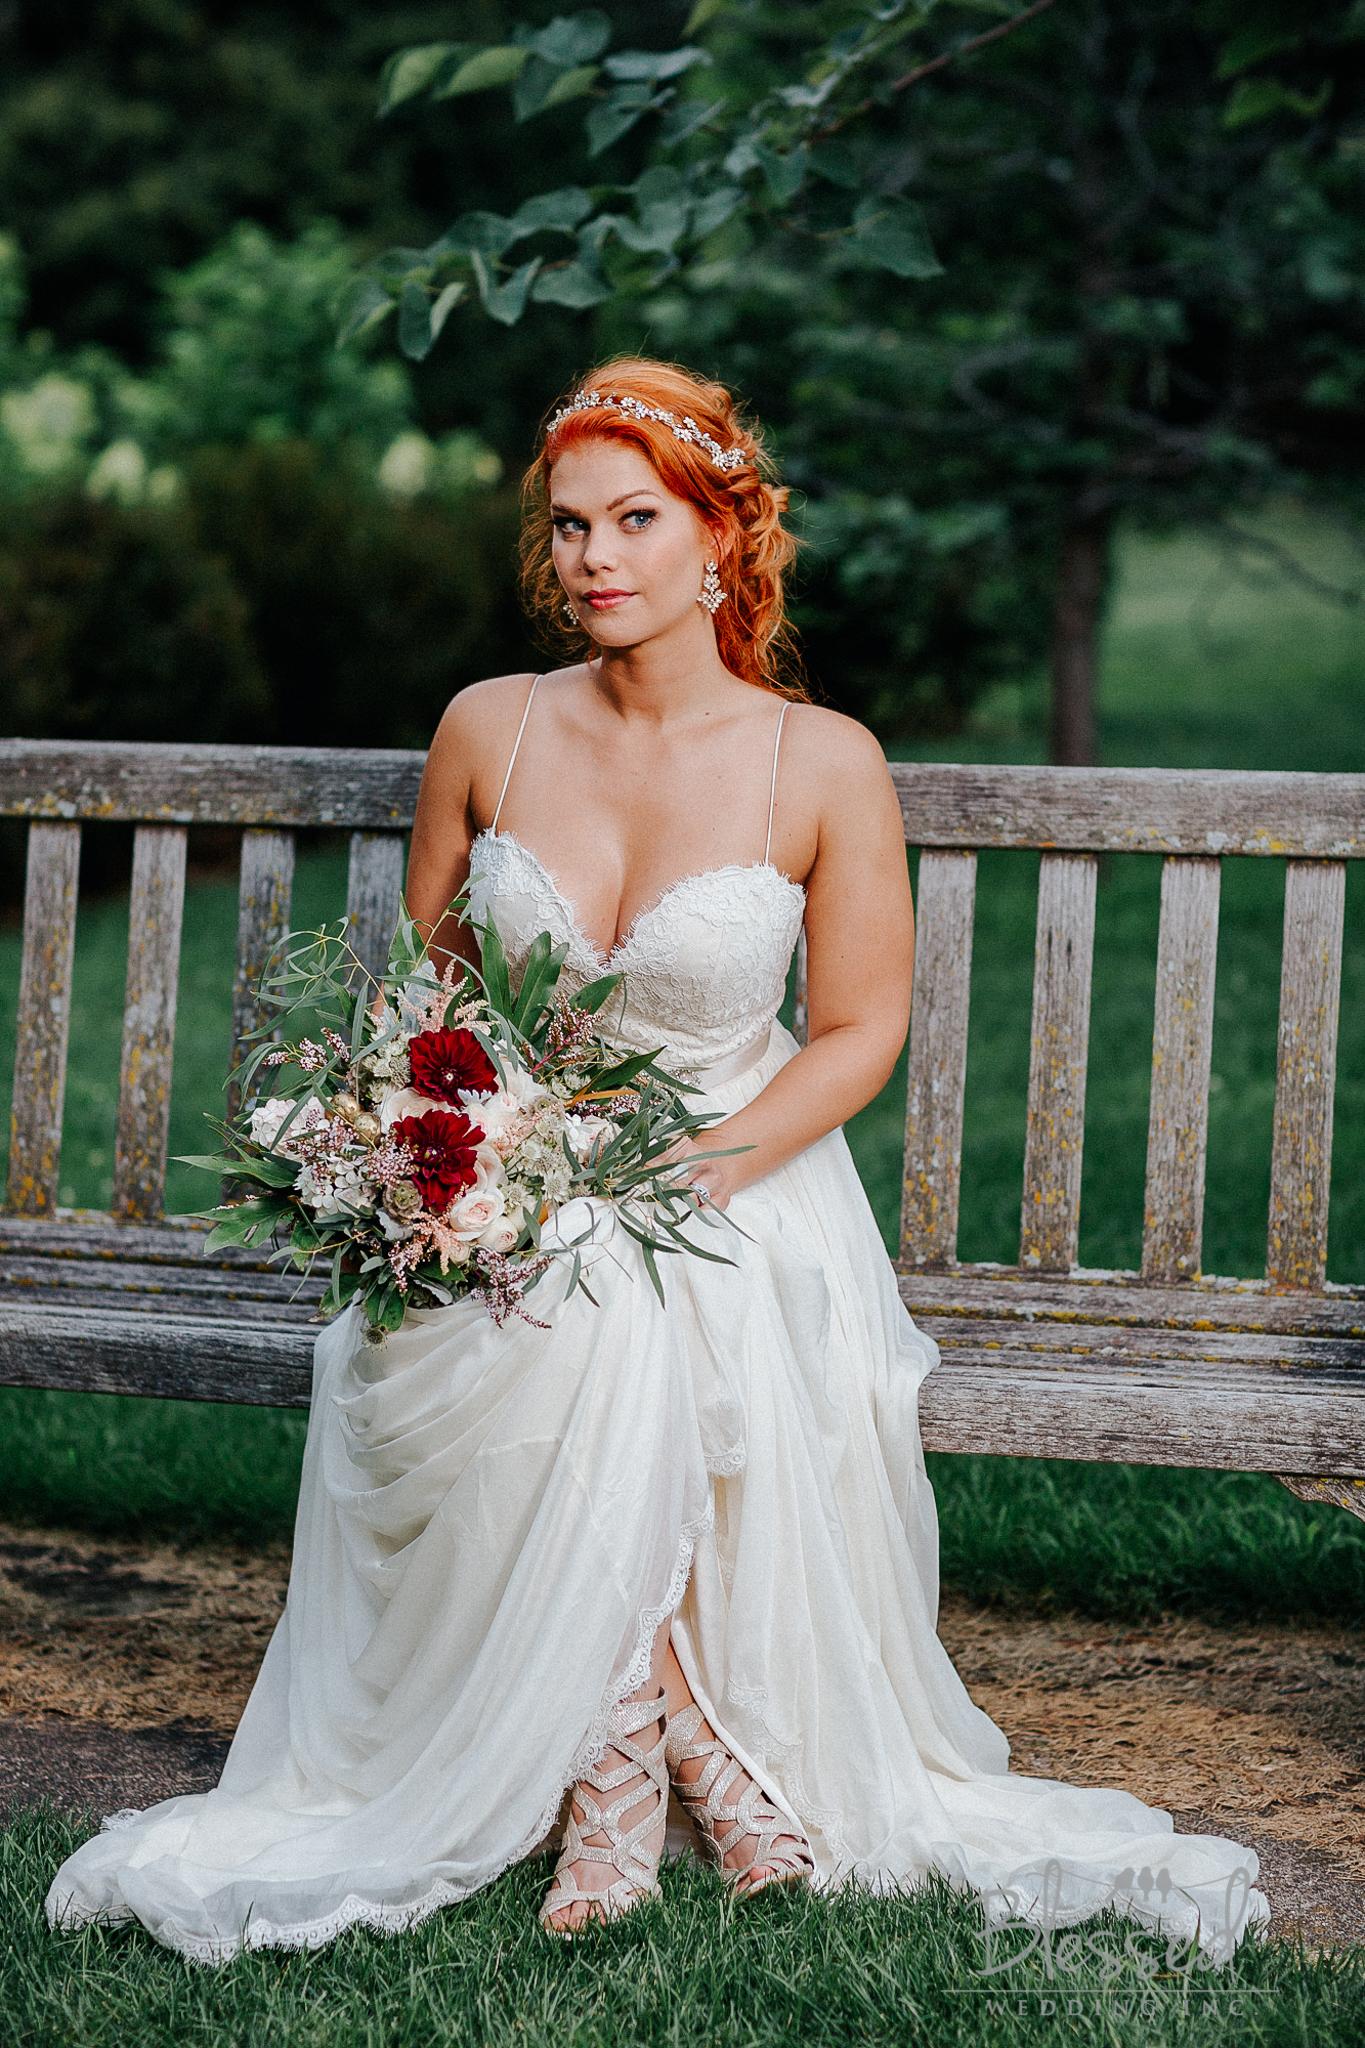 Destination Wedding Photography Minnesota By Blessed Wedding Photographers-40.jpg